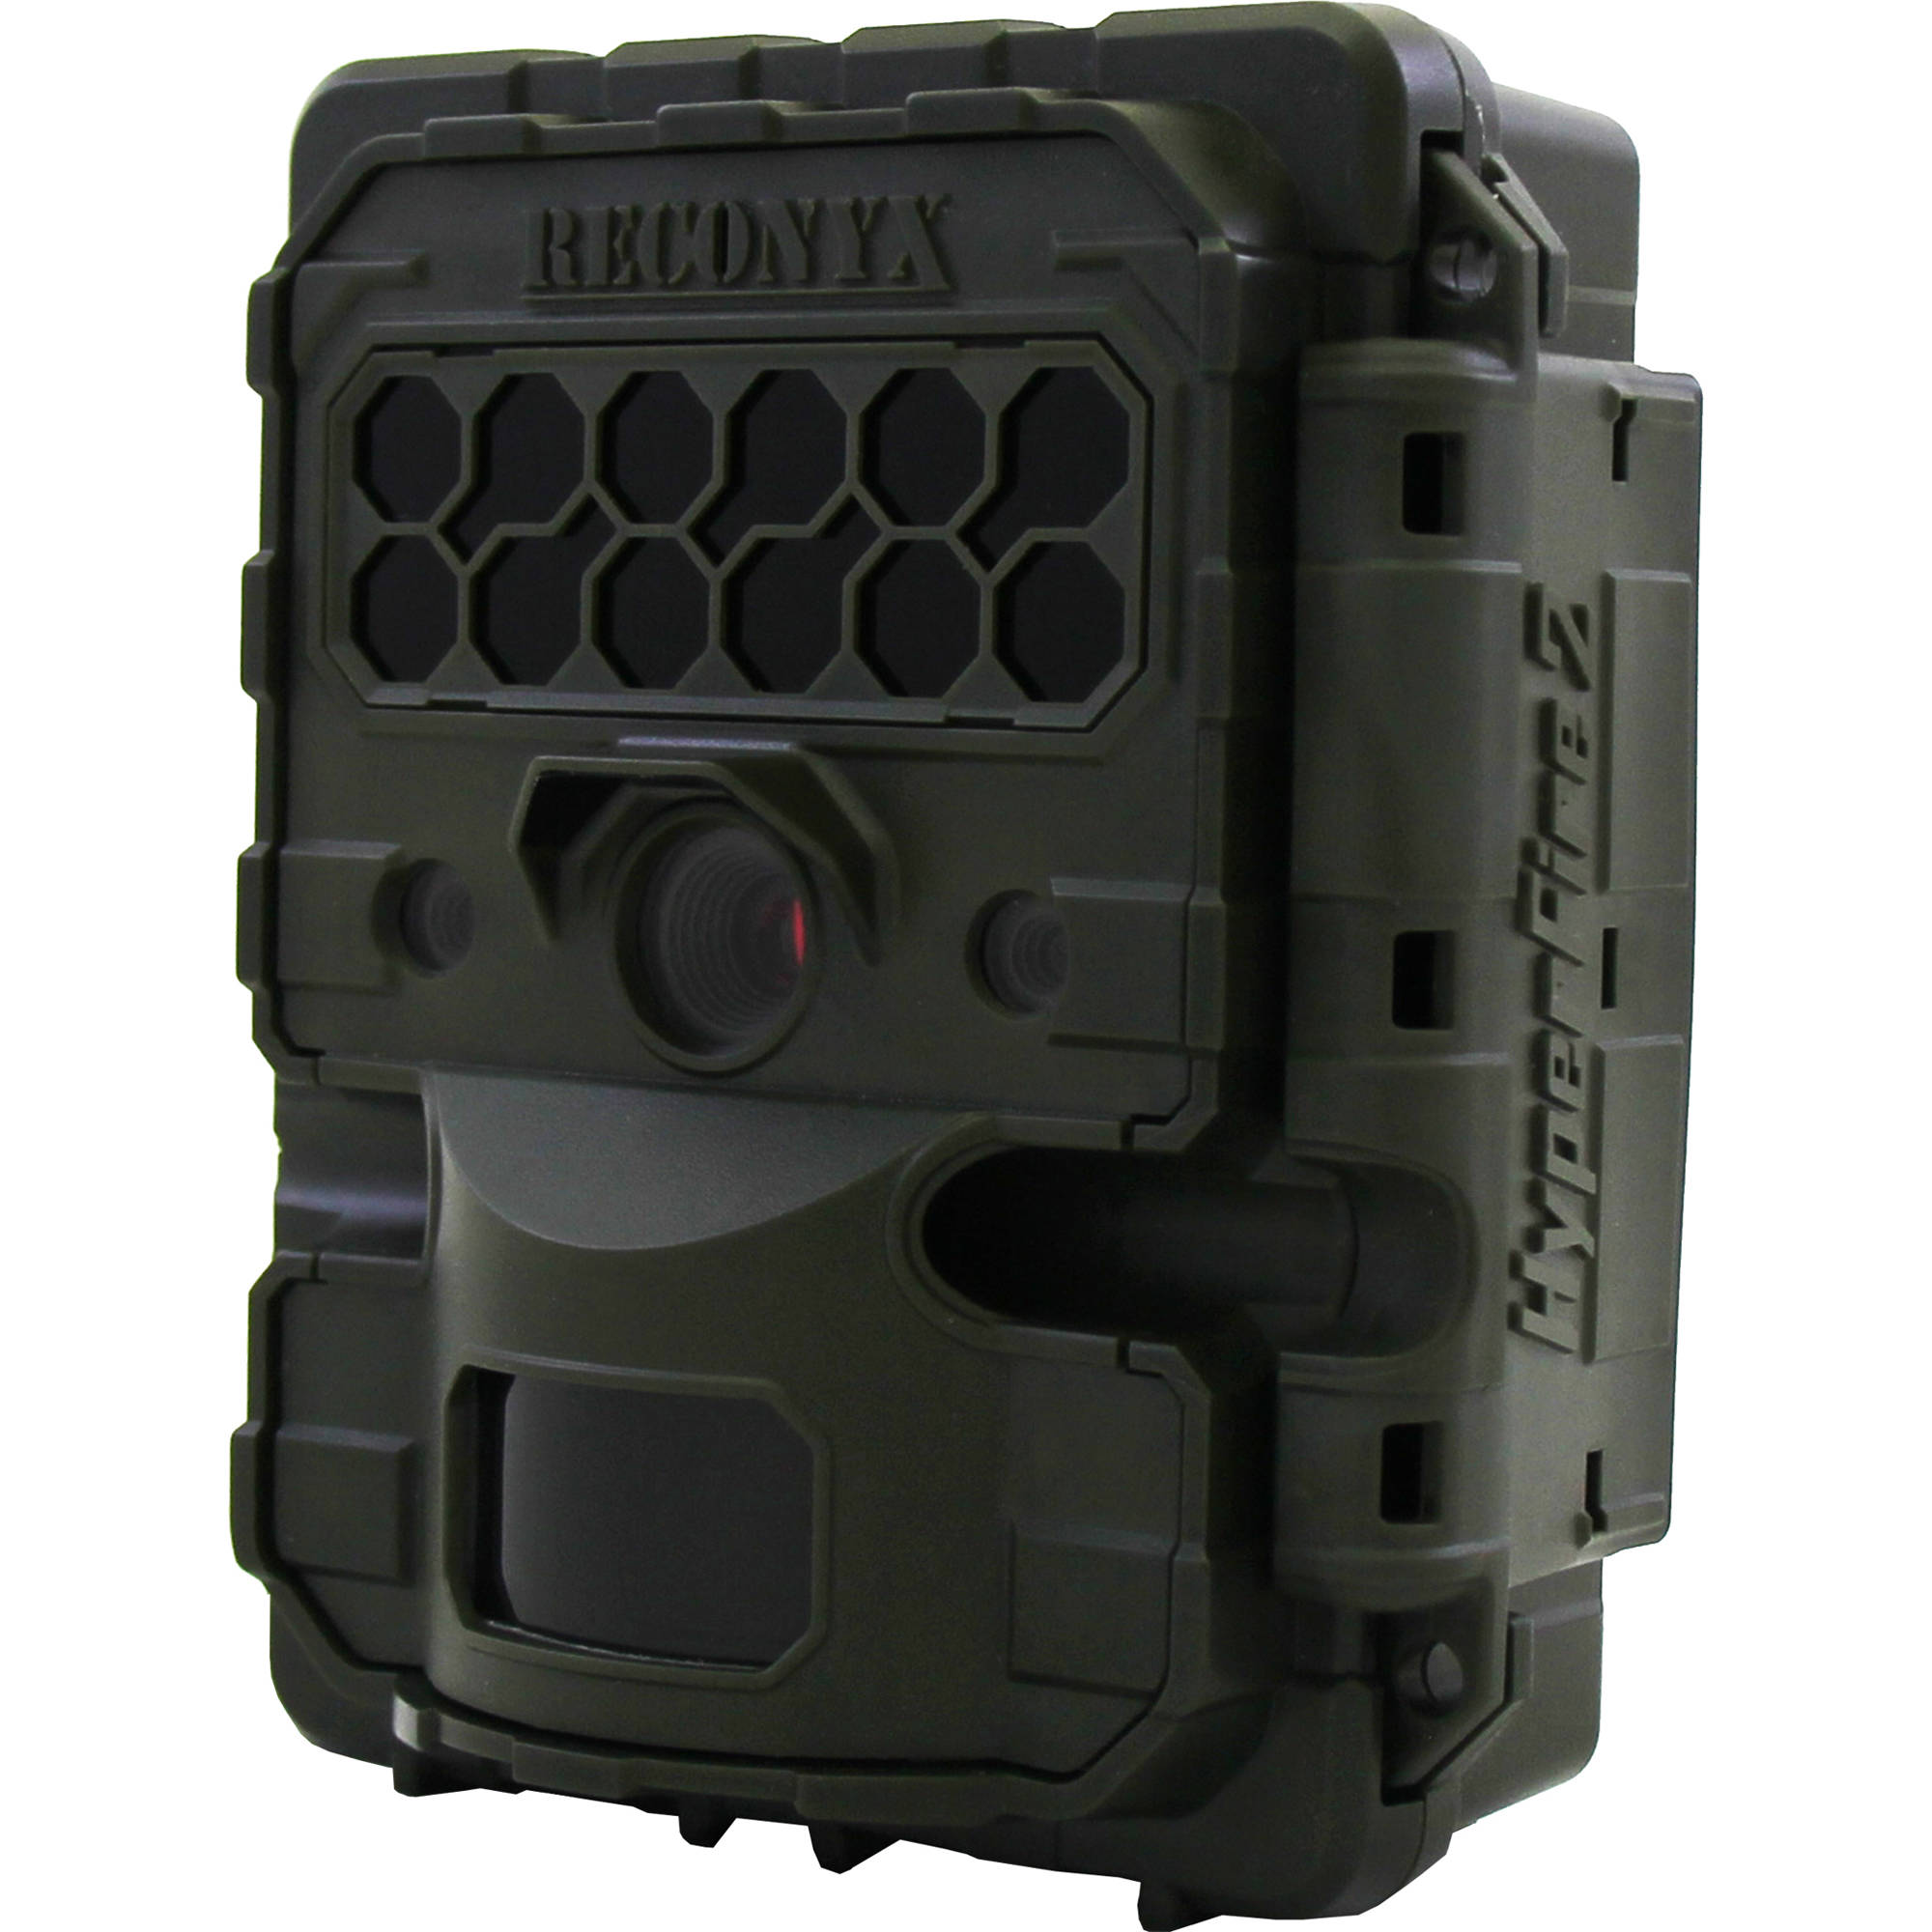 HF2X Hyperfire 2 Trail Camera (Olive Drab Green)